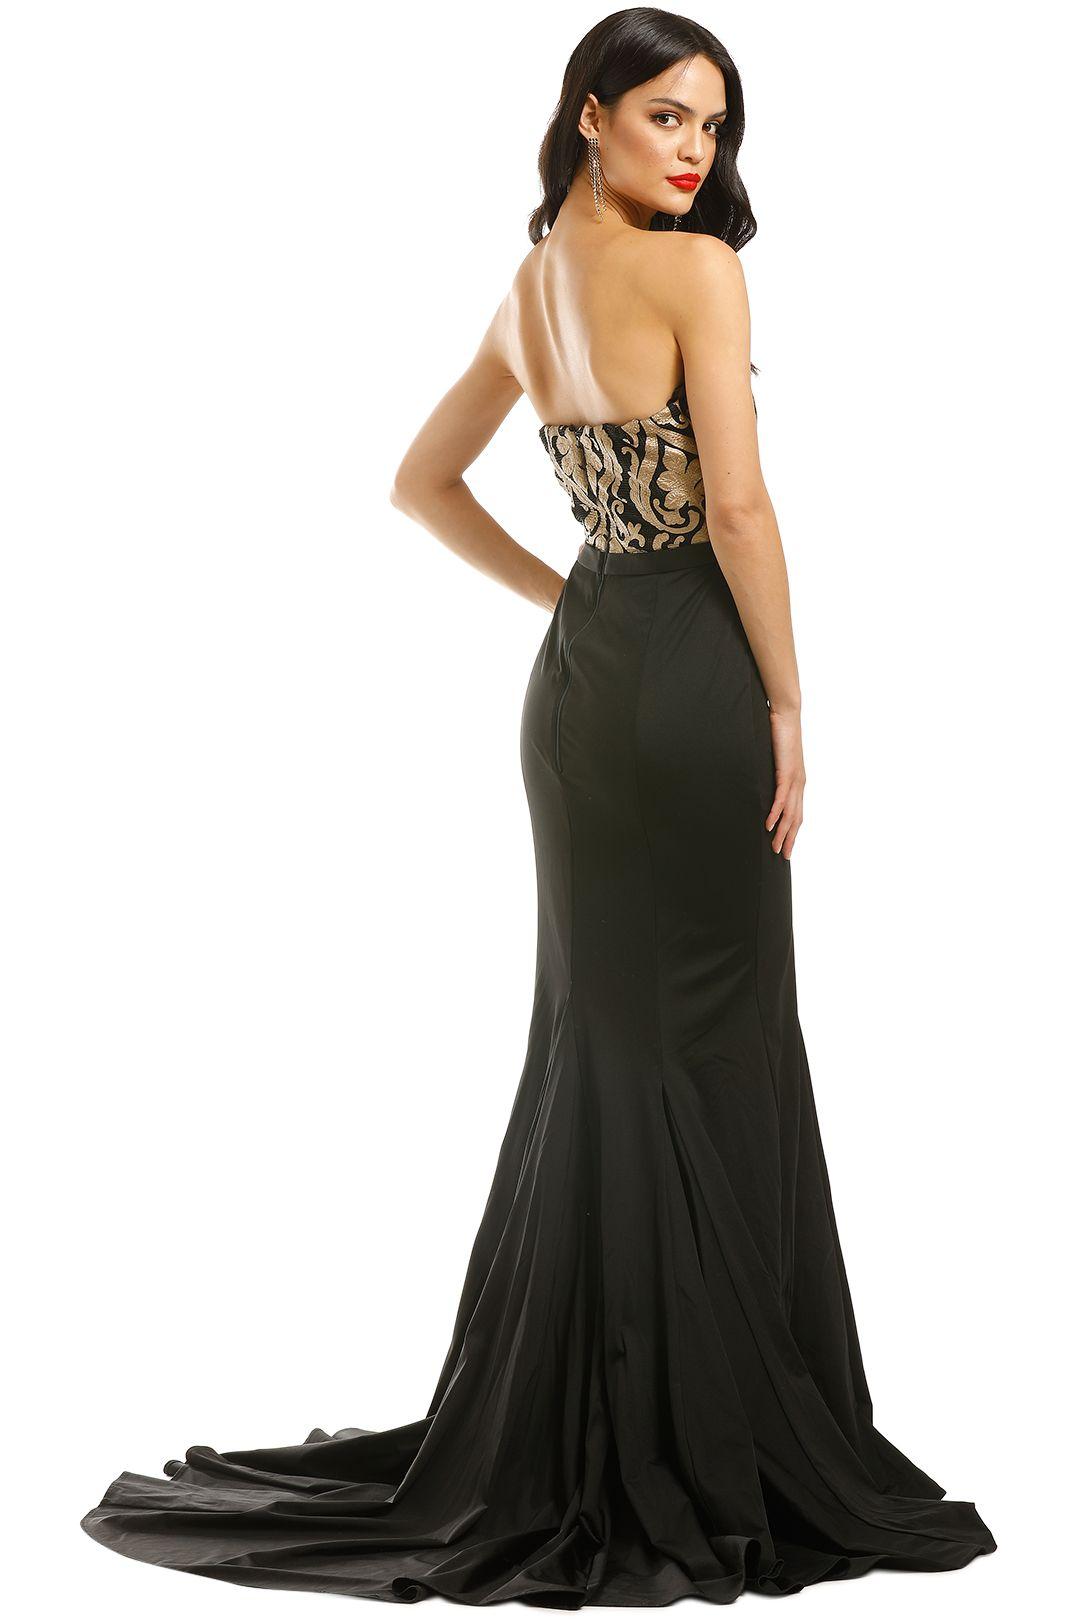 Jadore-Elsa-Gown-Gold-Black-Back